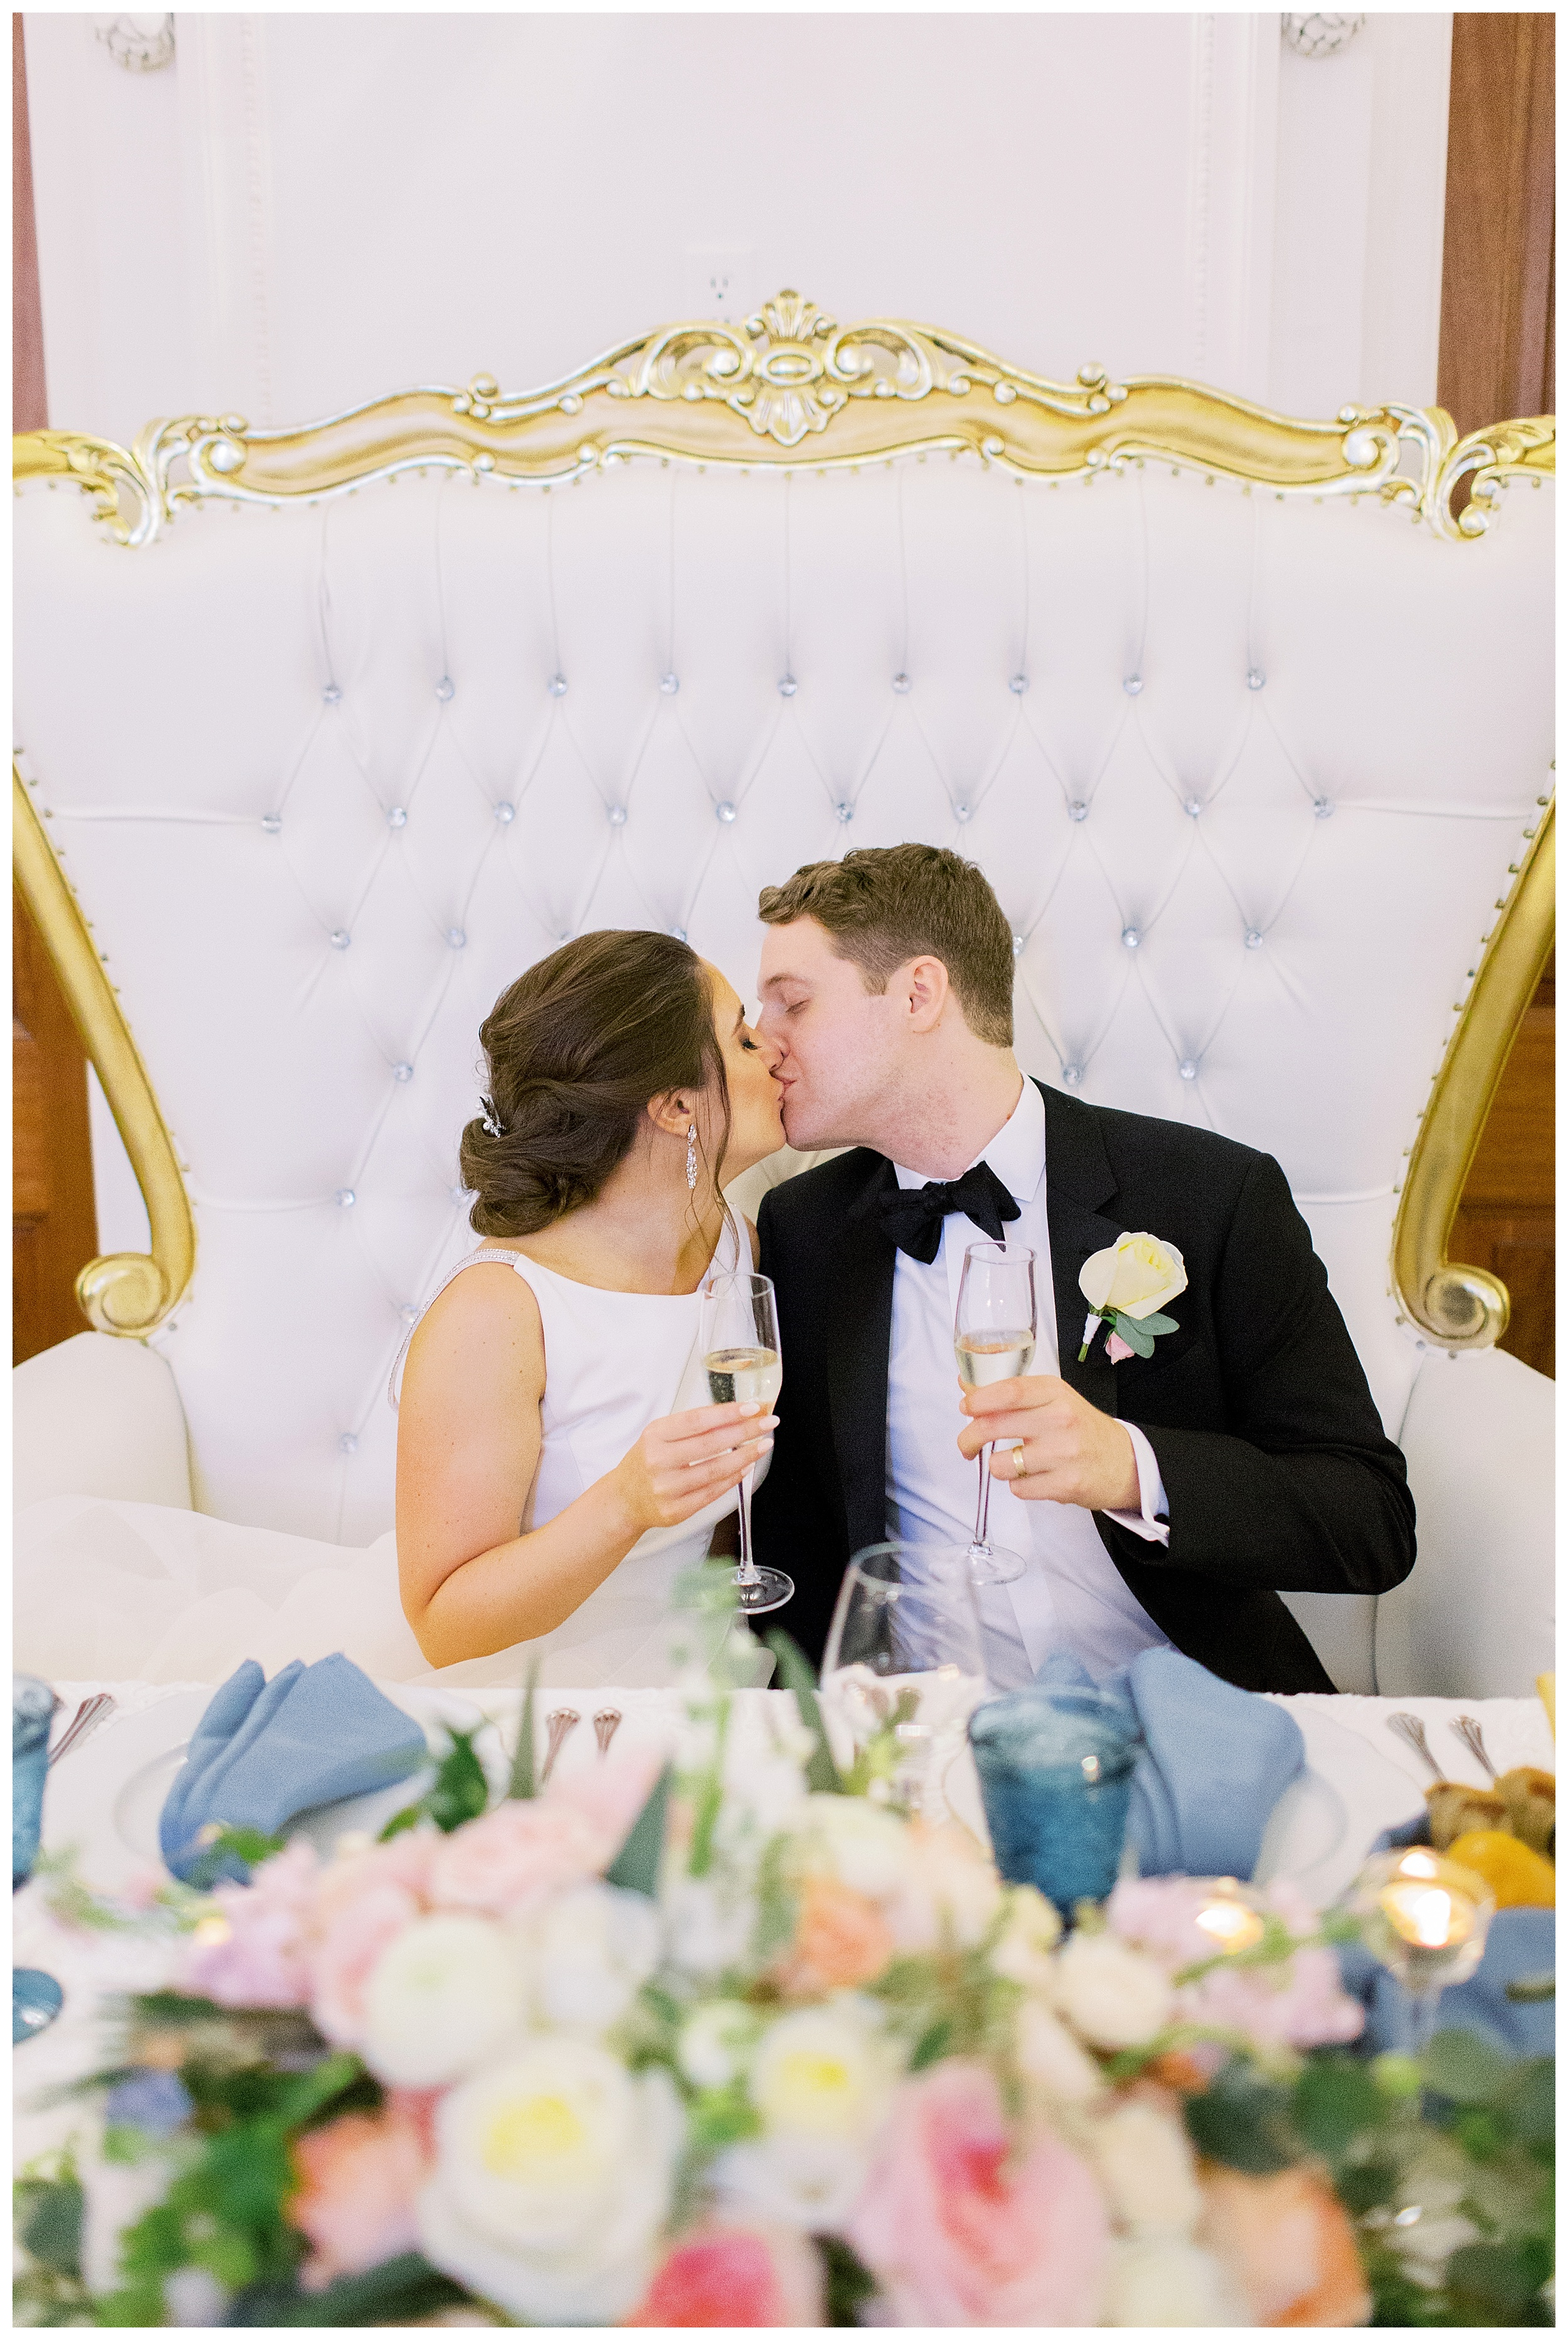 DAR Constitution Hall Wedding Wedding | Daughters of the American Revolution Wedding | District of Columbia Film Wedding Photographer Kir Tuben_0134.jpg